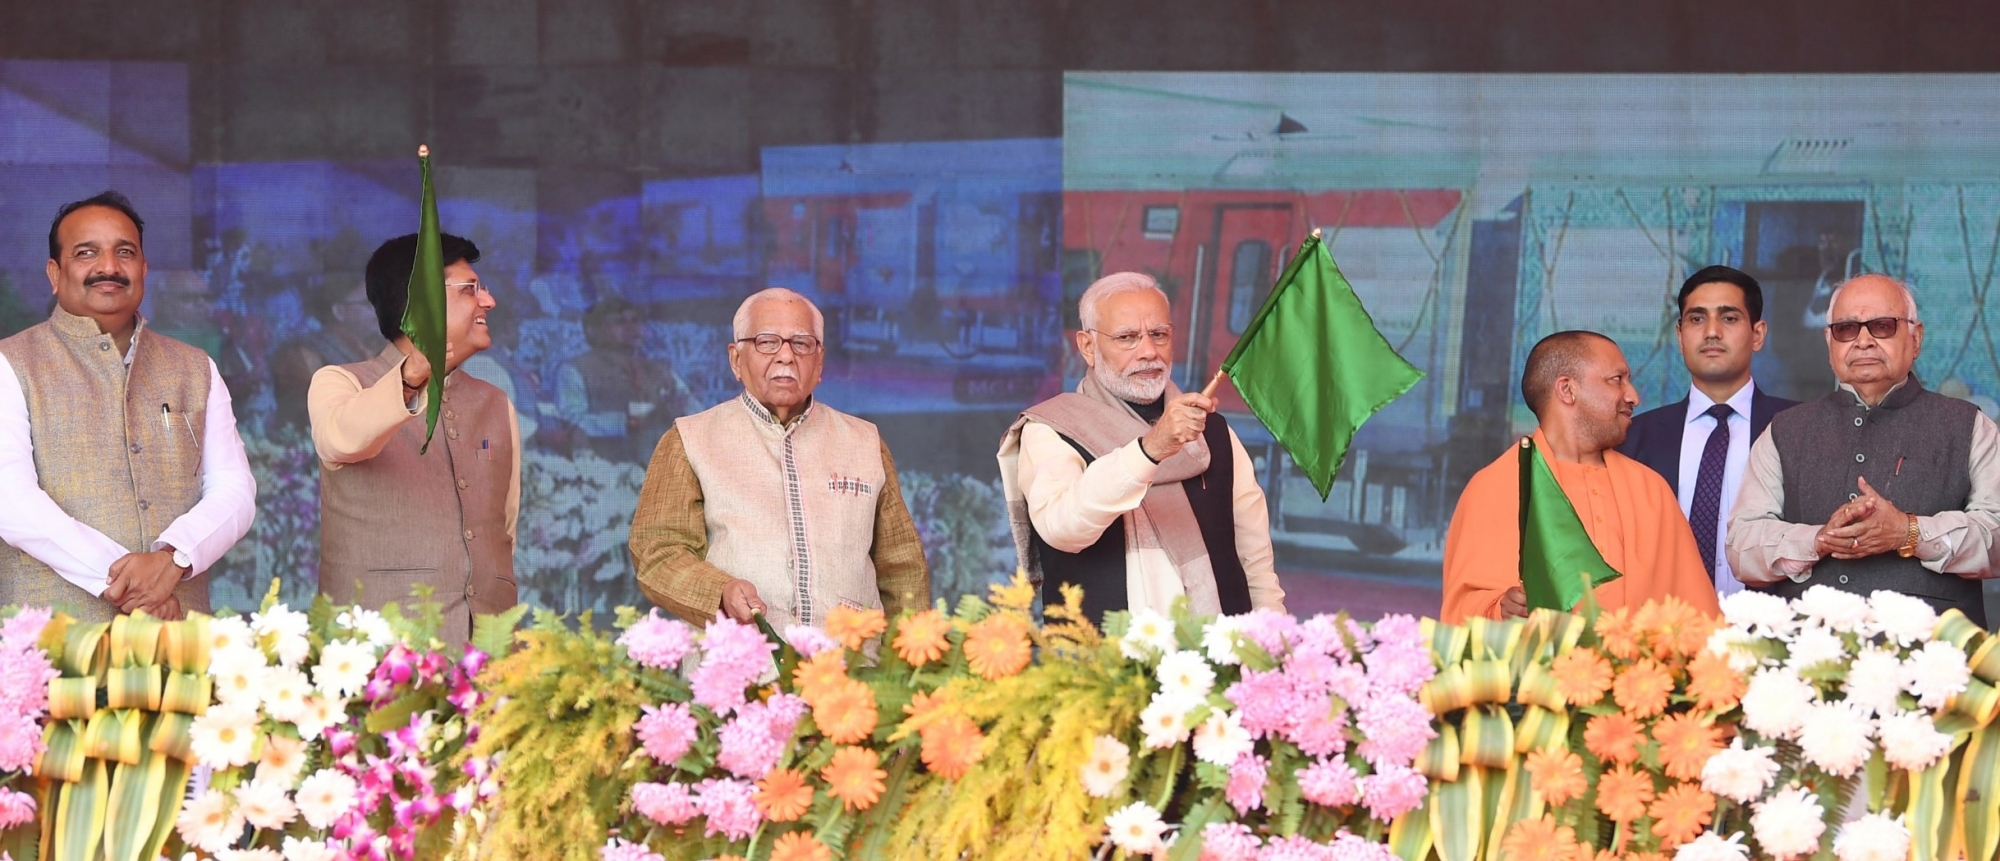 Narendra Modi, Rahul Gandhi, Sonia Gandhi, Indian Army, Humsafar train, Rafale jet deal, Prime Minister, Congress, Bhartiya Janata party, Rae Bareli, Uttar Pradesh, Politics news